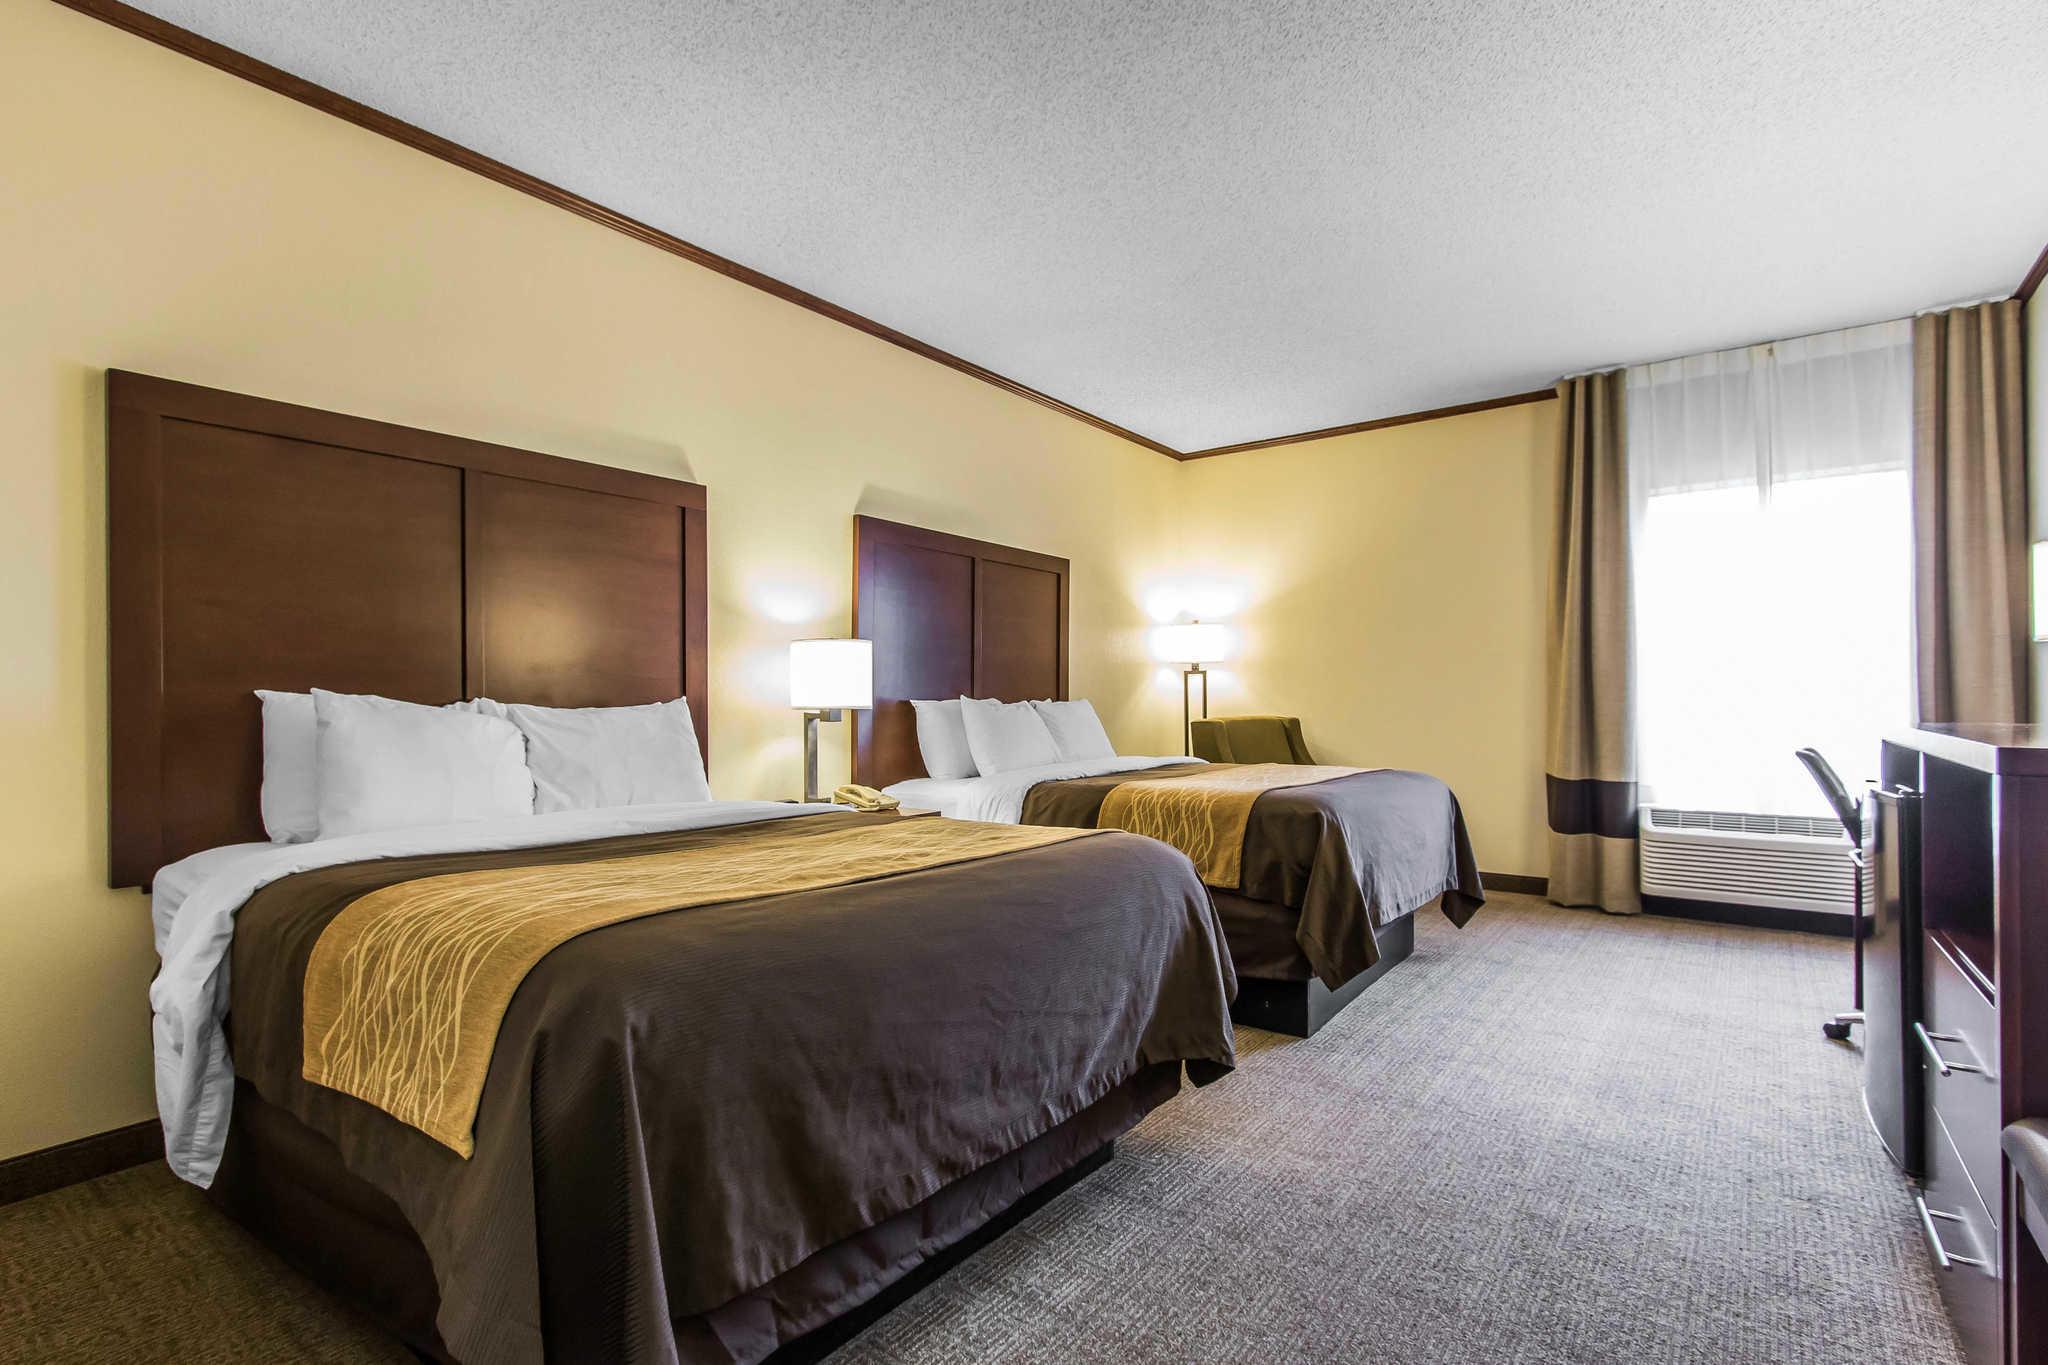 Comfort Inn & Suites Ardmore image 12